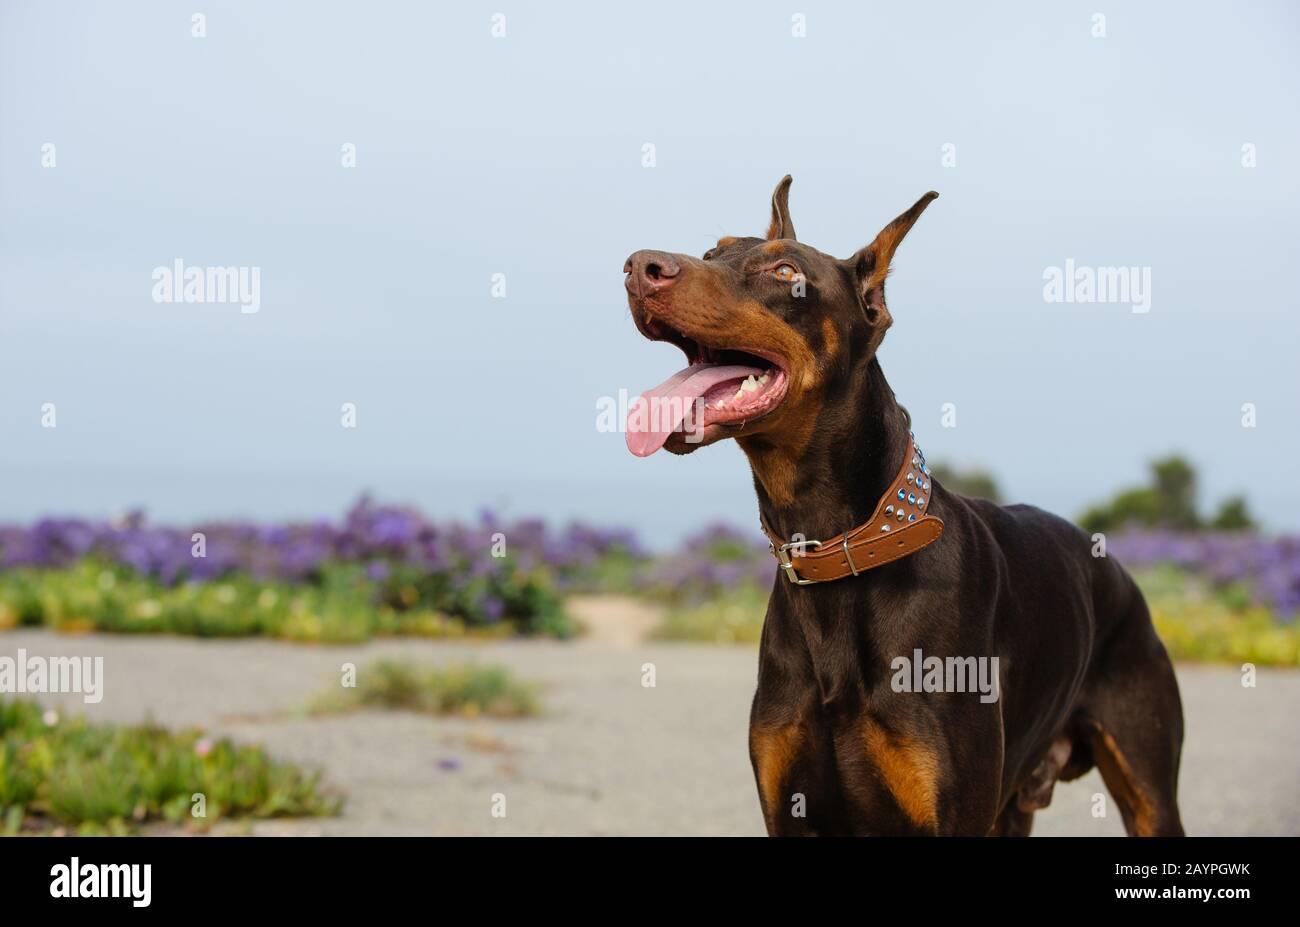 Doberman Pinscher Dog Stock Photo Alamy